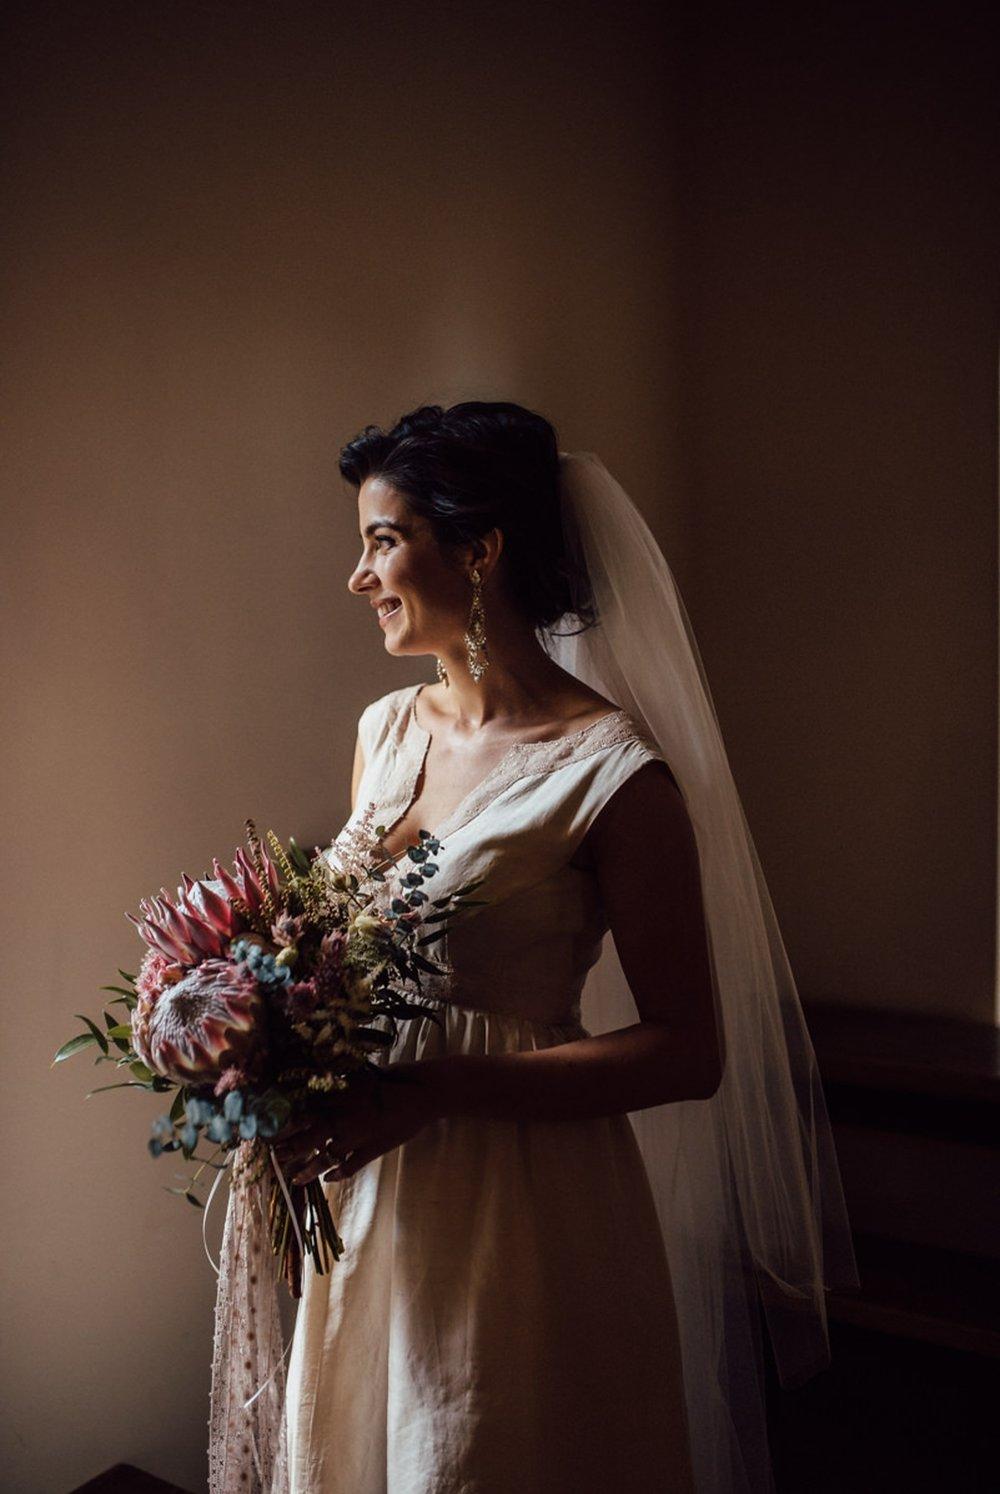 Liat-Aharoni-Toronto-Wedding 48.jpg